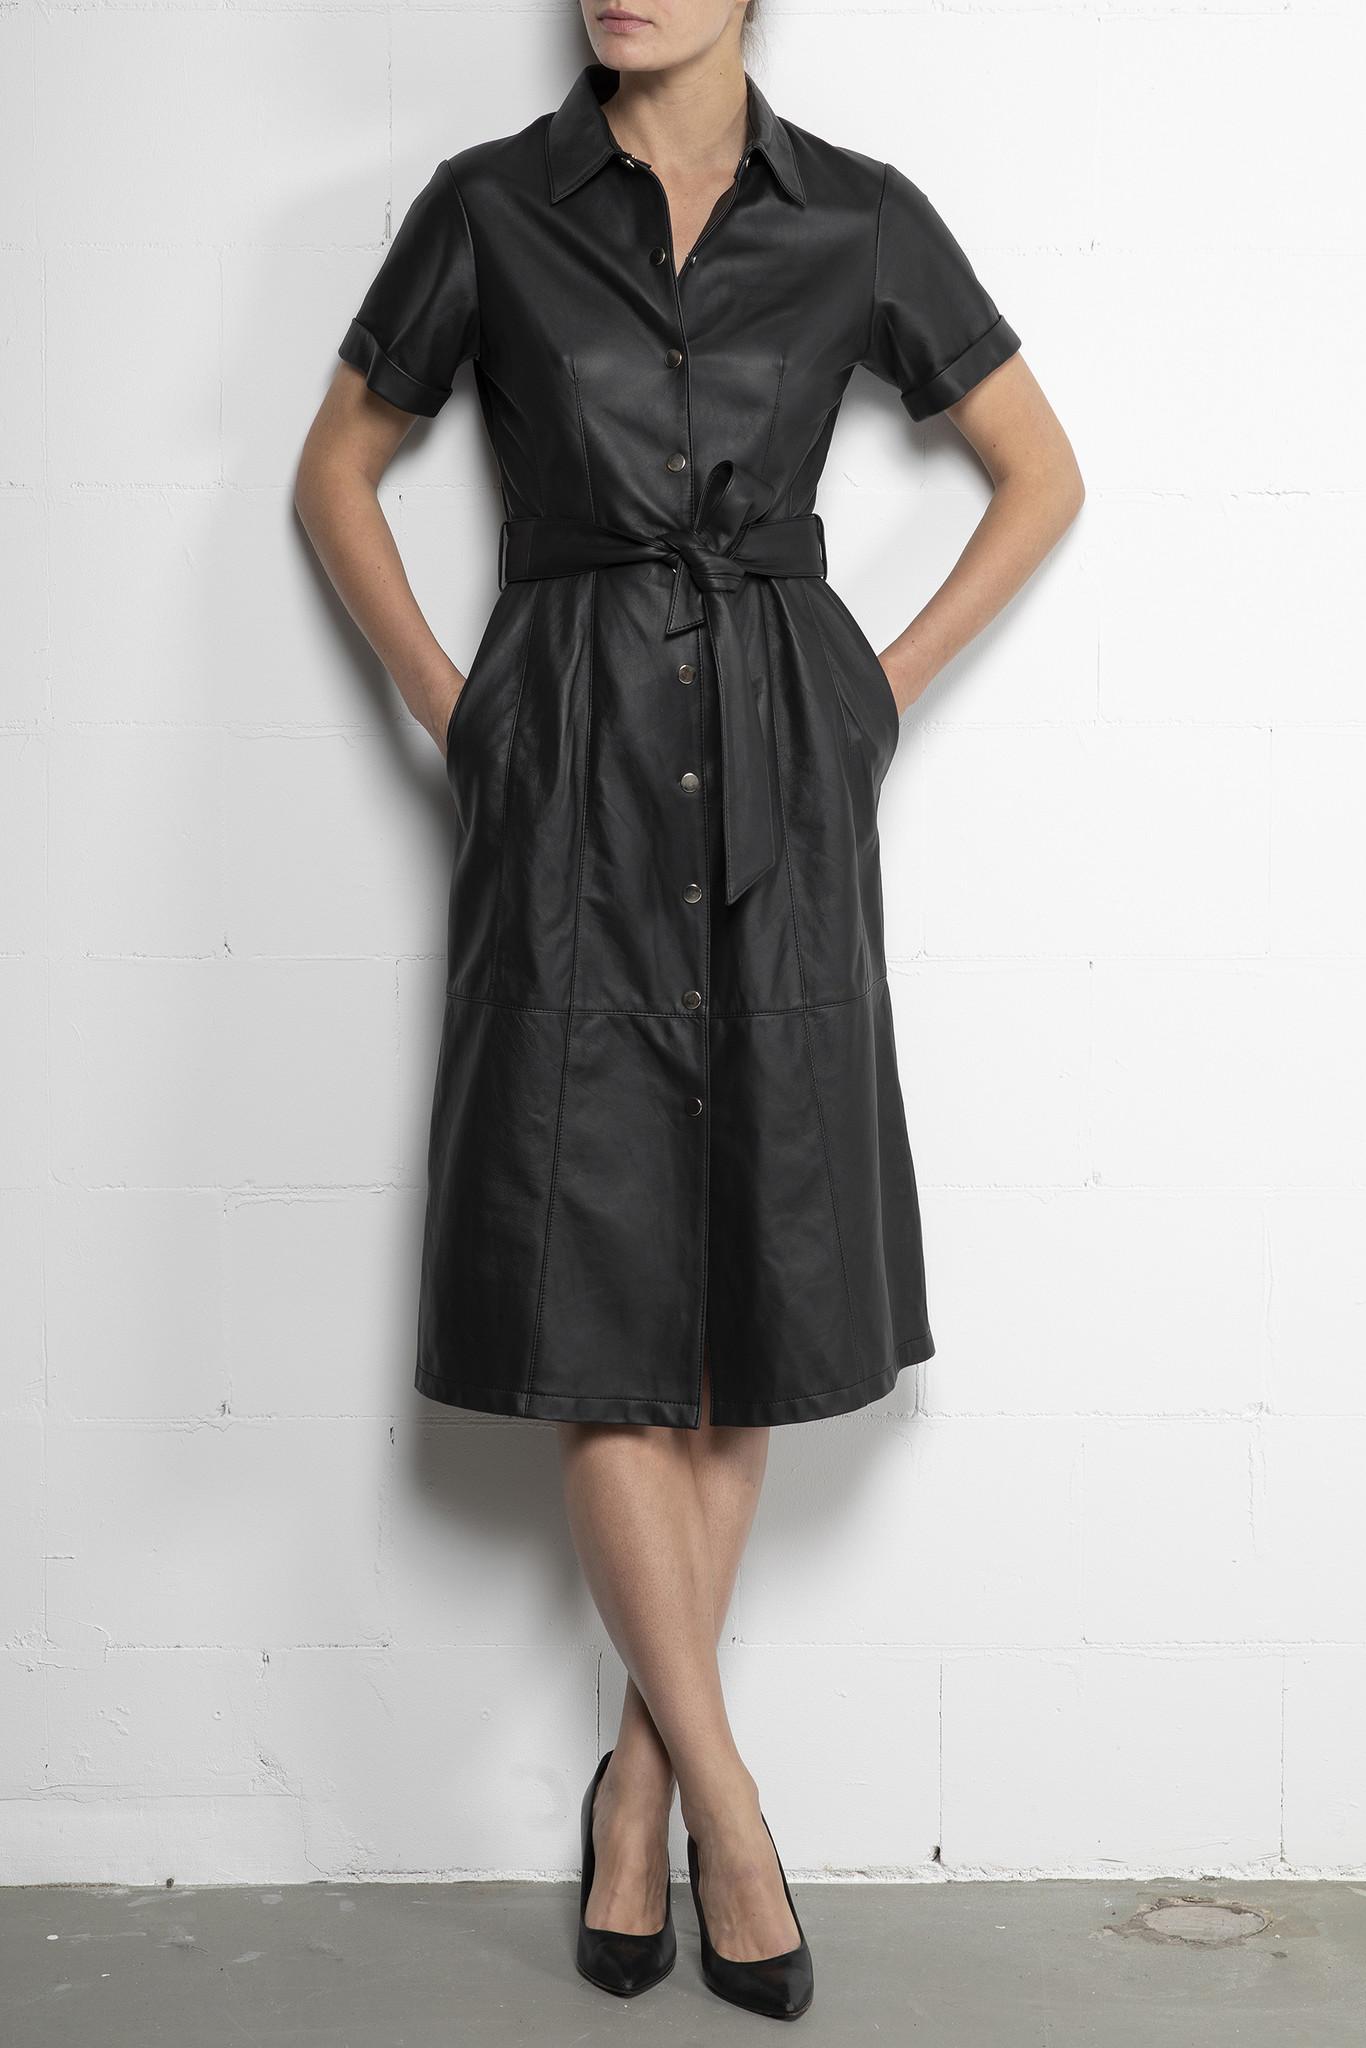 black dress - ZINGA Leather